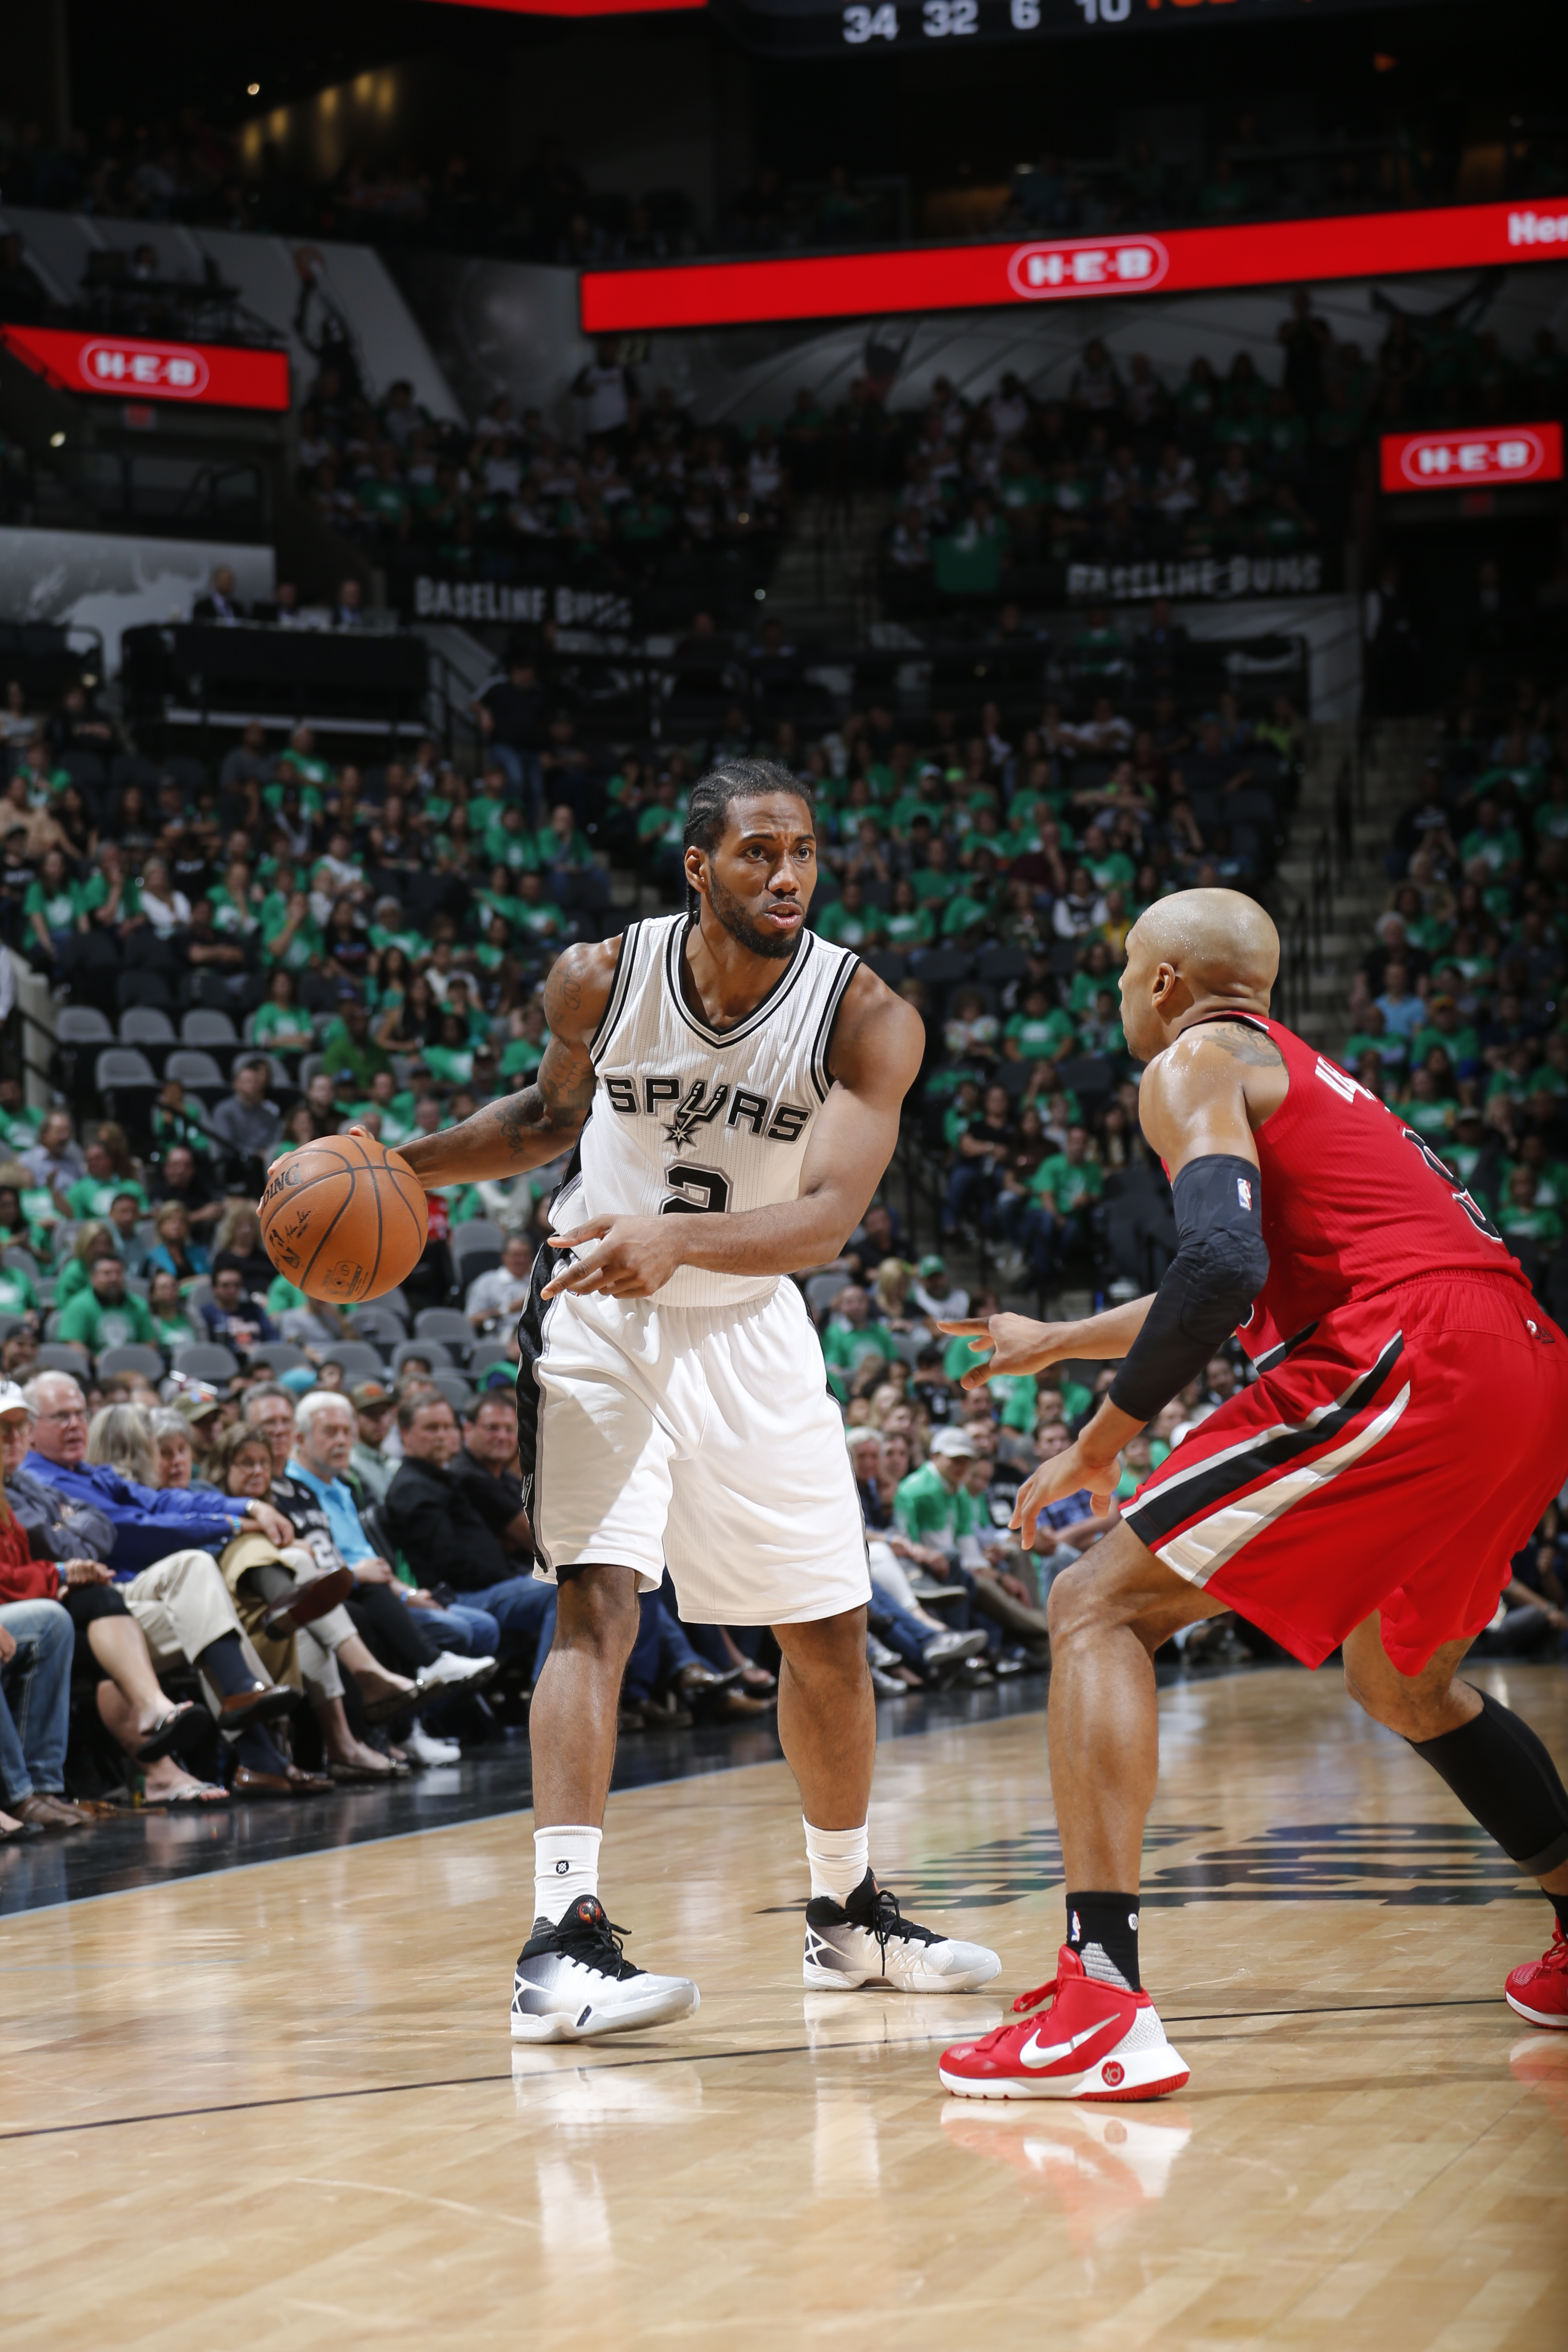 SAN ANTONIO, TX - MARCH 17:  Kawhi Leonard #2 of the San Antonio Spurs handles the ball against the Portland Trail Blazers on March 17, 2016 at the AT&T Center in San Antonio, Texas.